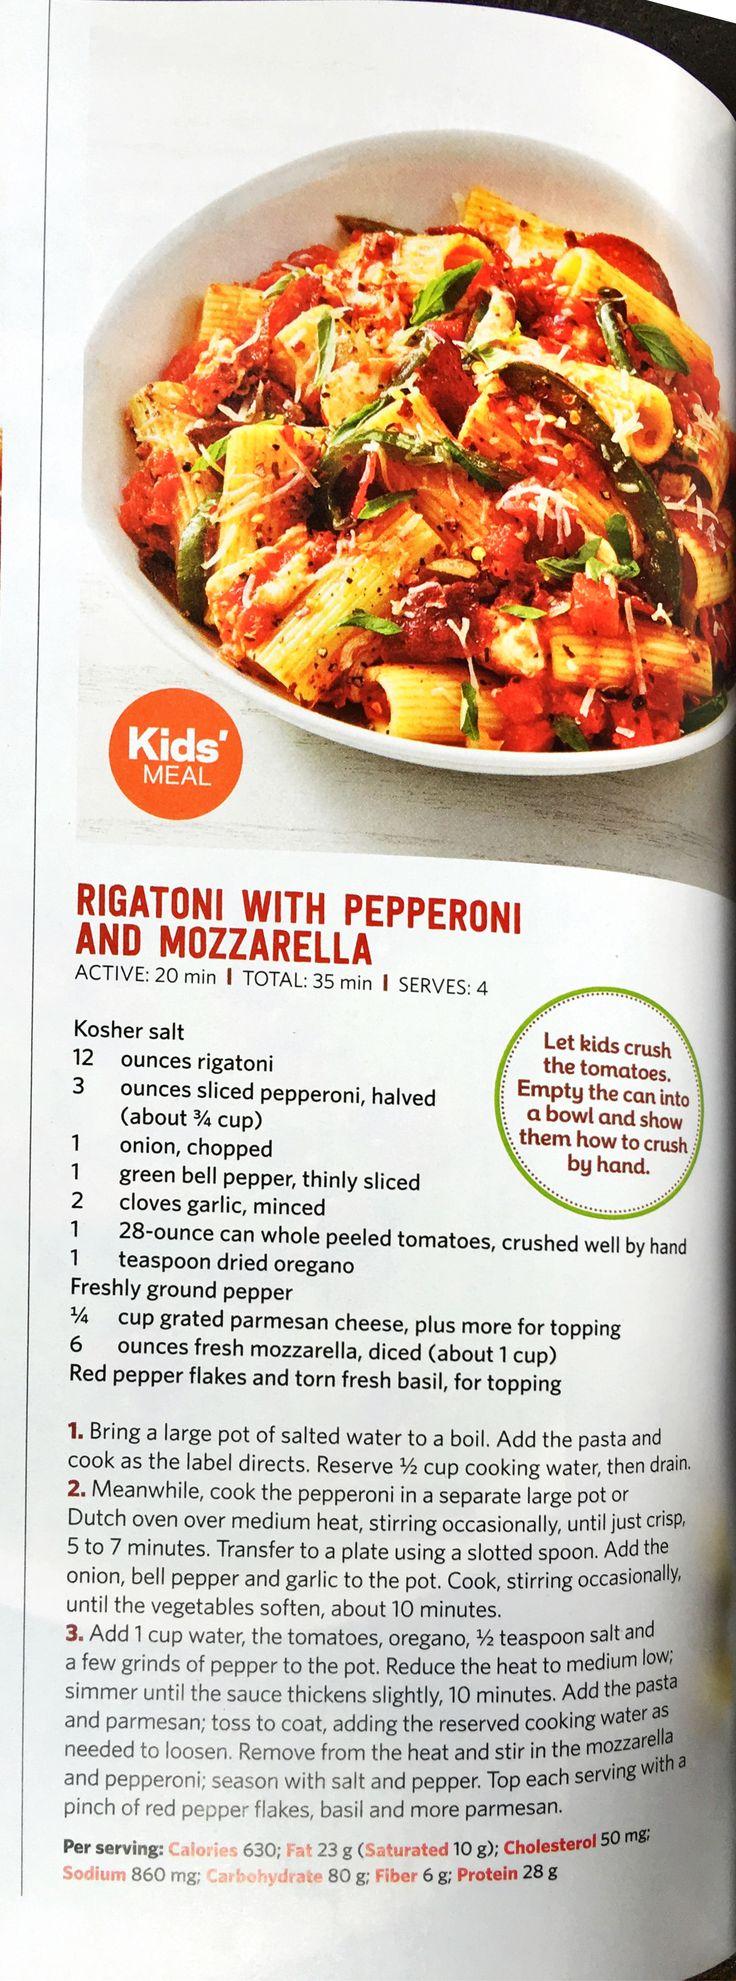 Rigatoni w Pepperoni u0026 Mozzarella 26 best